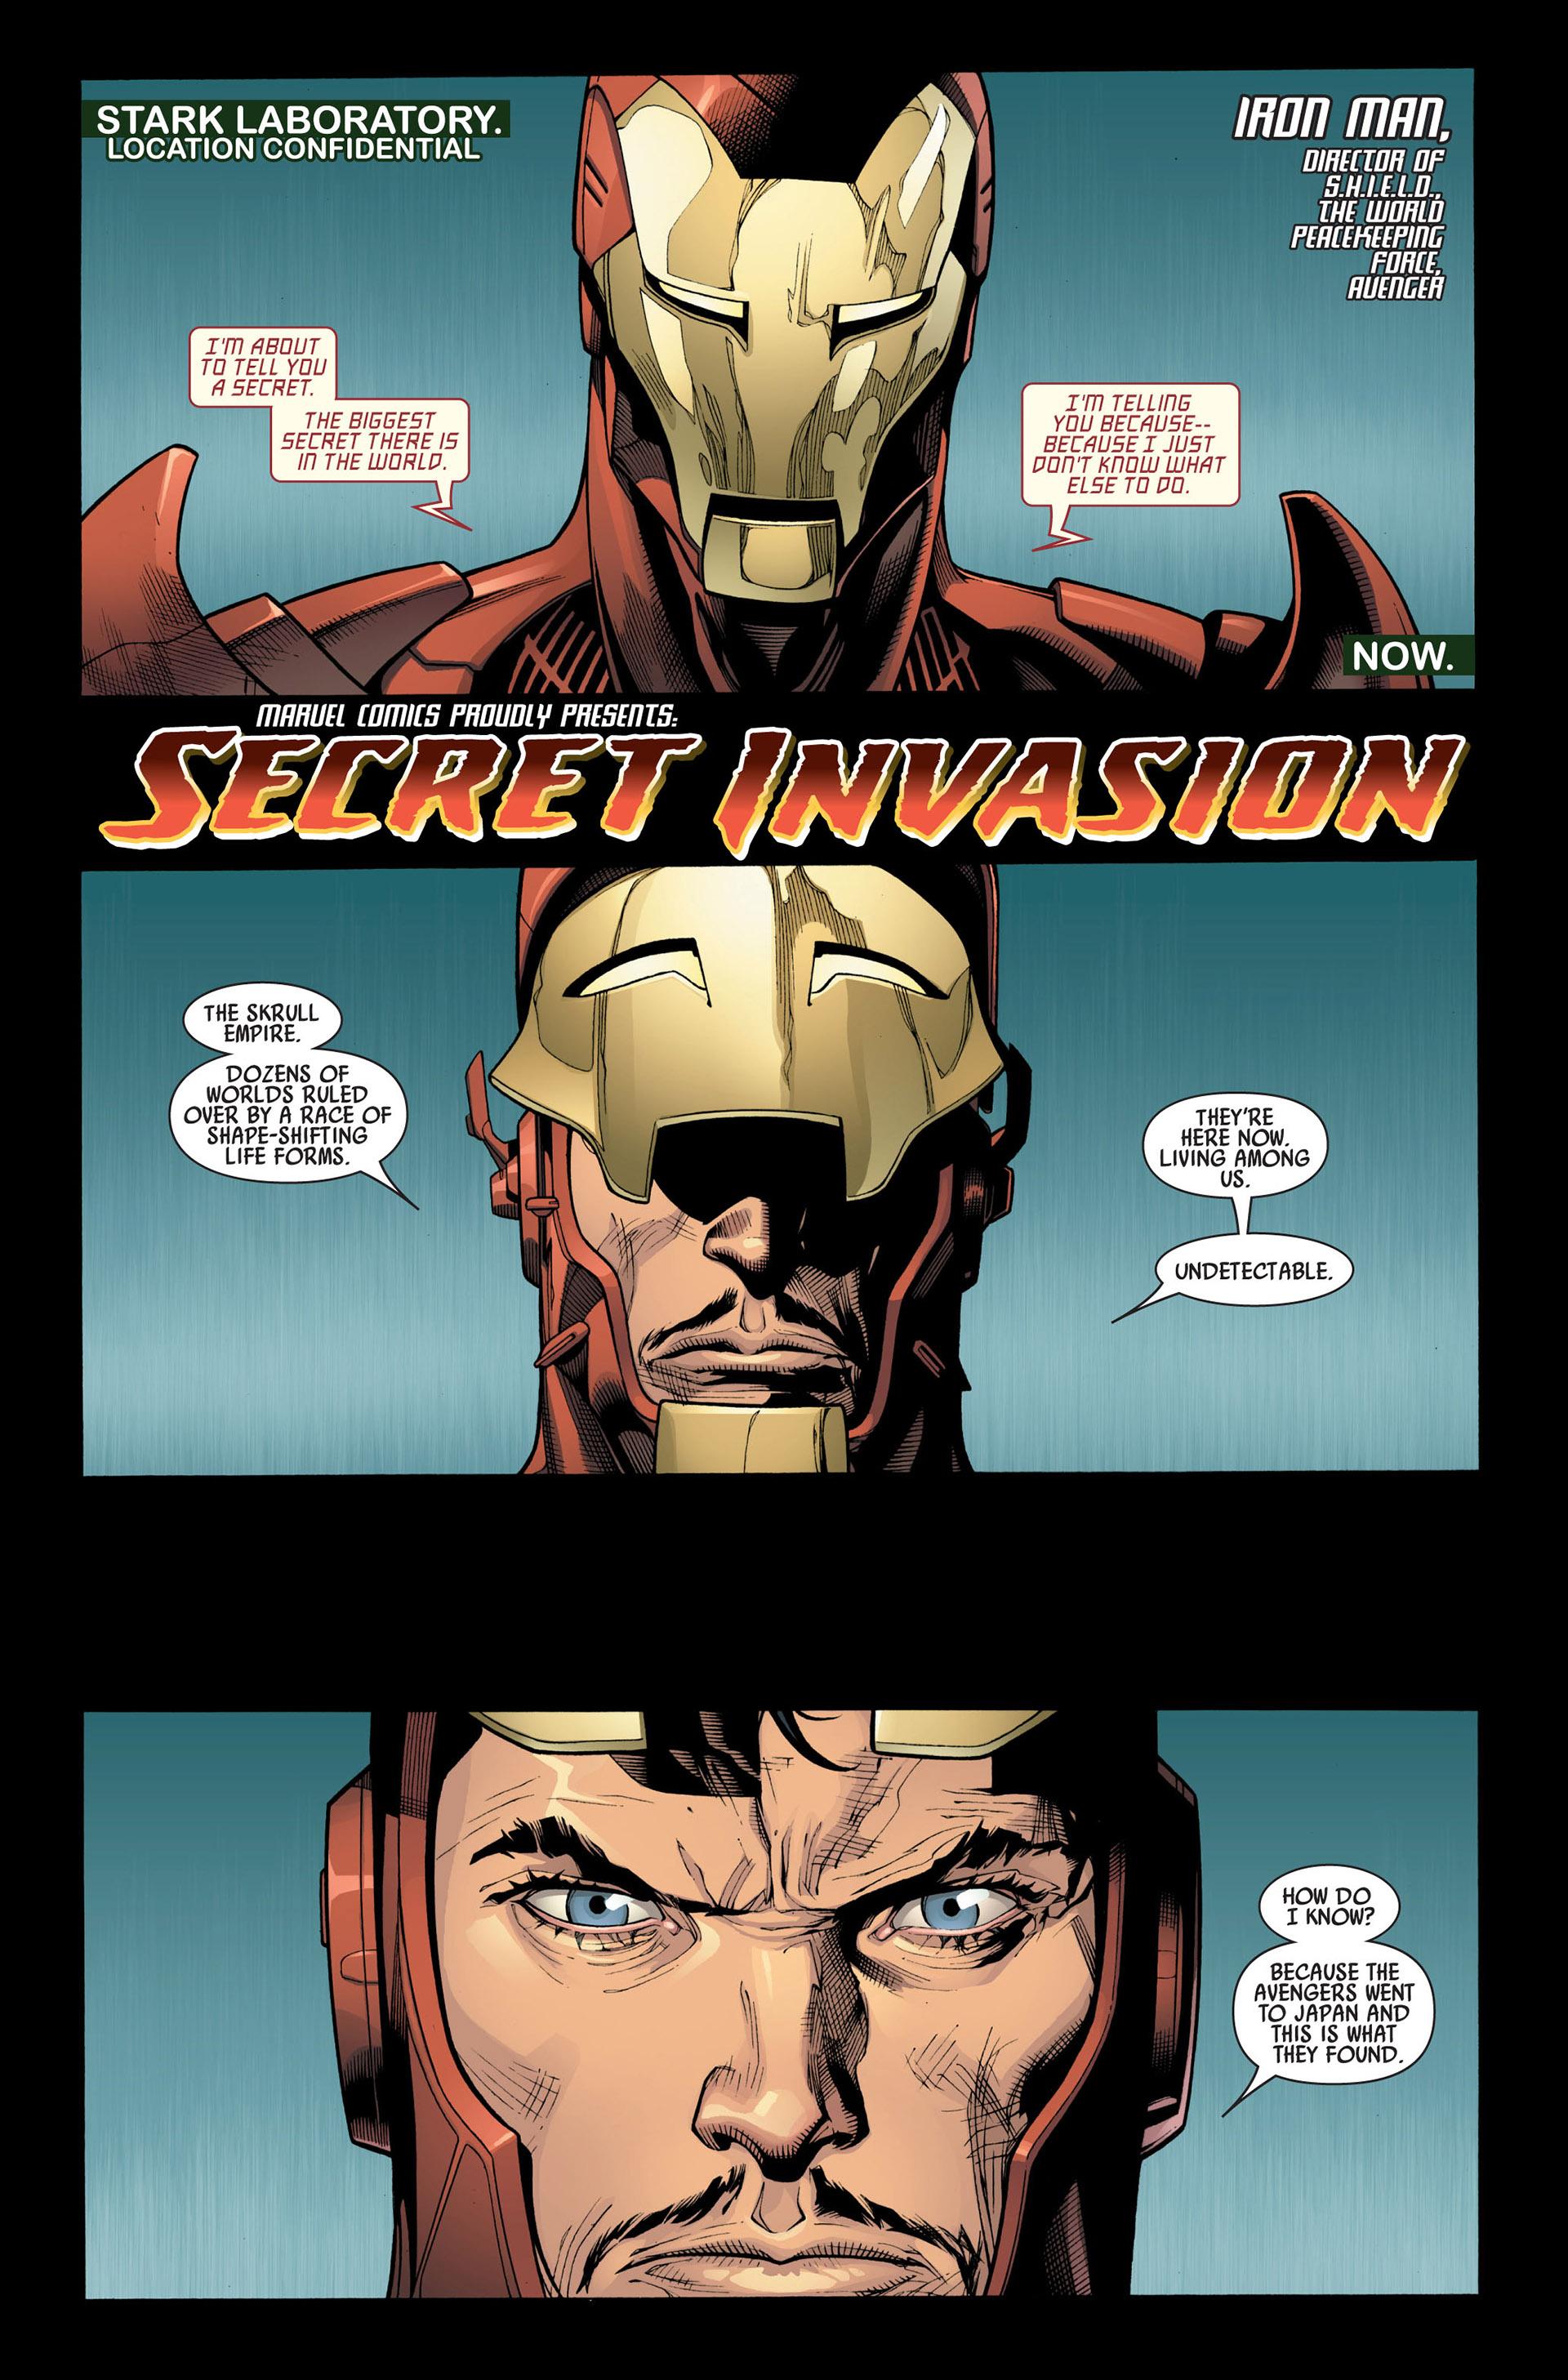 Read online Secret Invasion comic -  Issue #1 - 4